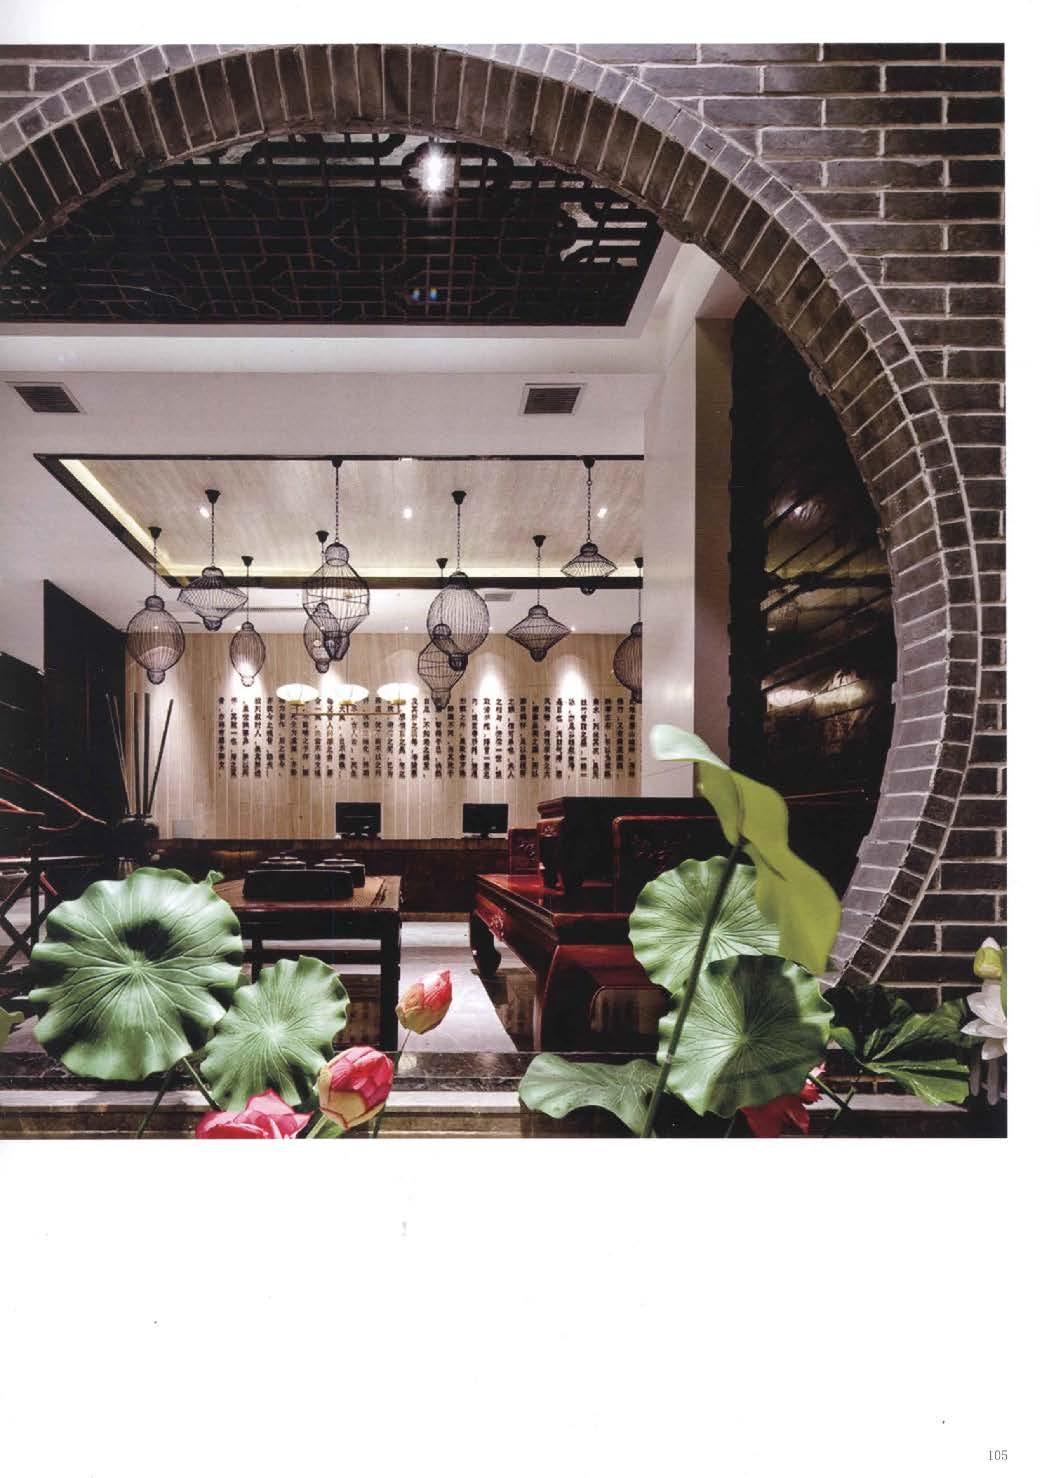 H073 东方风情 会所、餐饮细部解析_Page_103.jpg